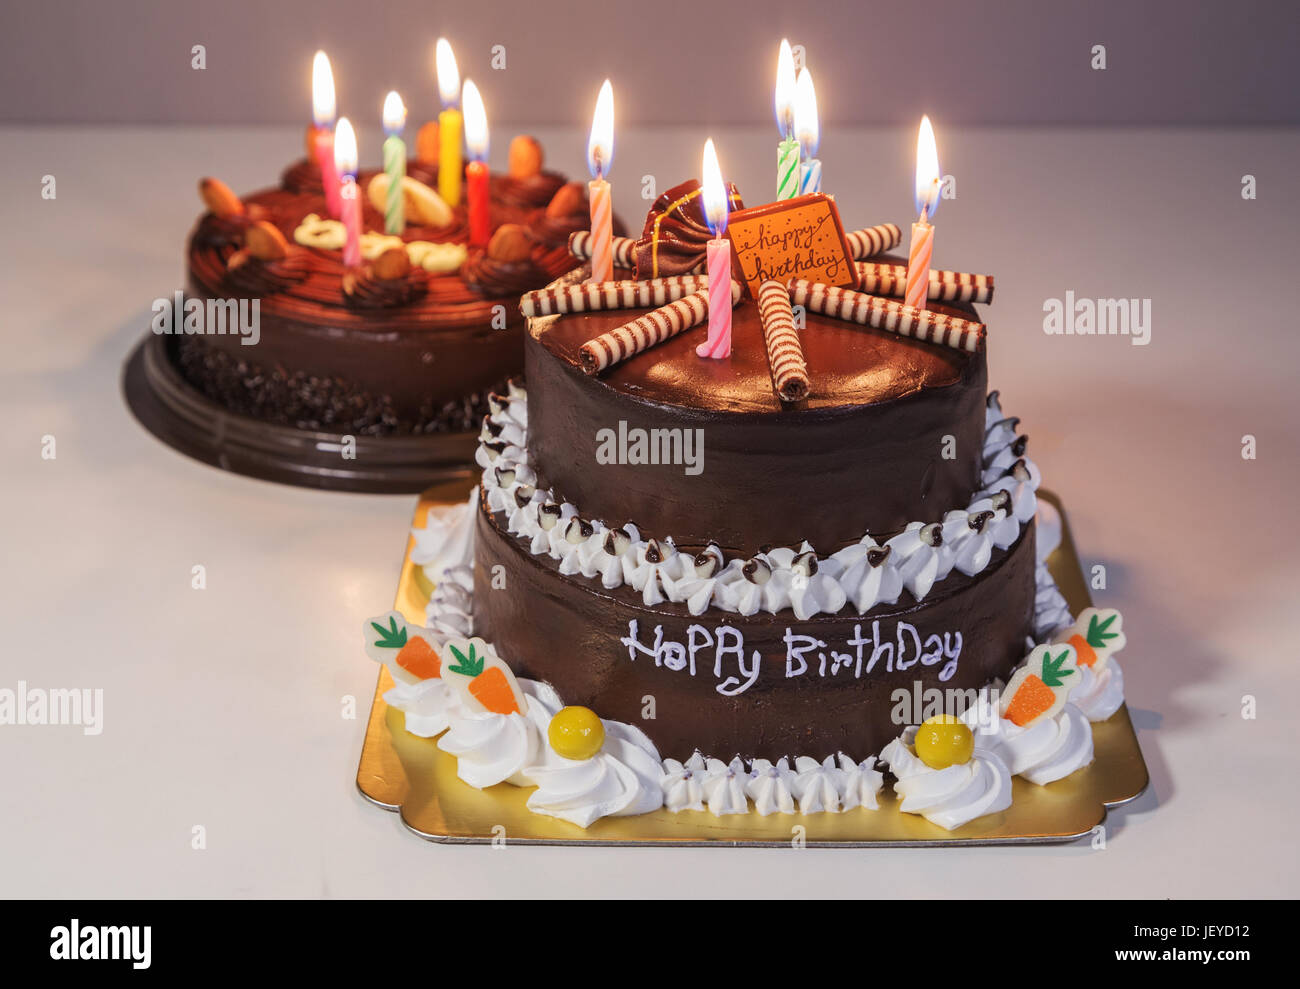 Wondrous Two Chocolate Cake With Happy Birthday Light Candle Stock Photo Personalised Birthday Cards Veneteletsinfo